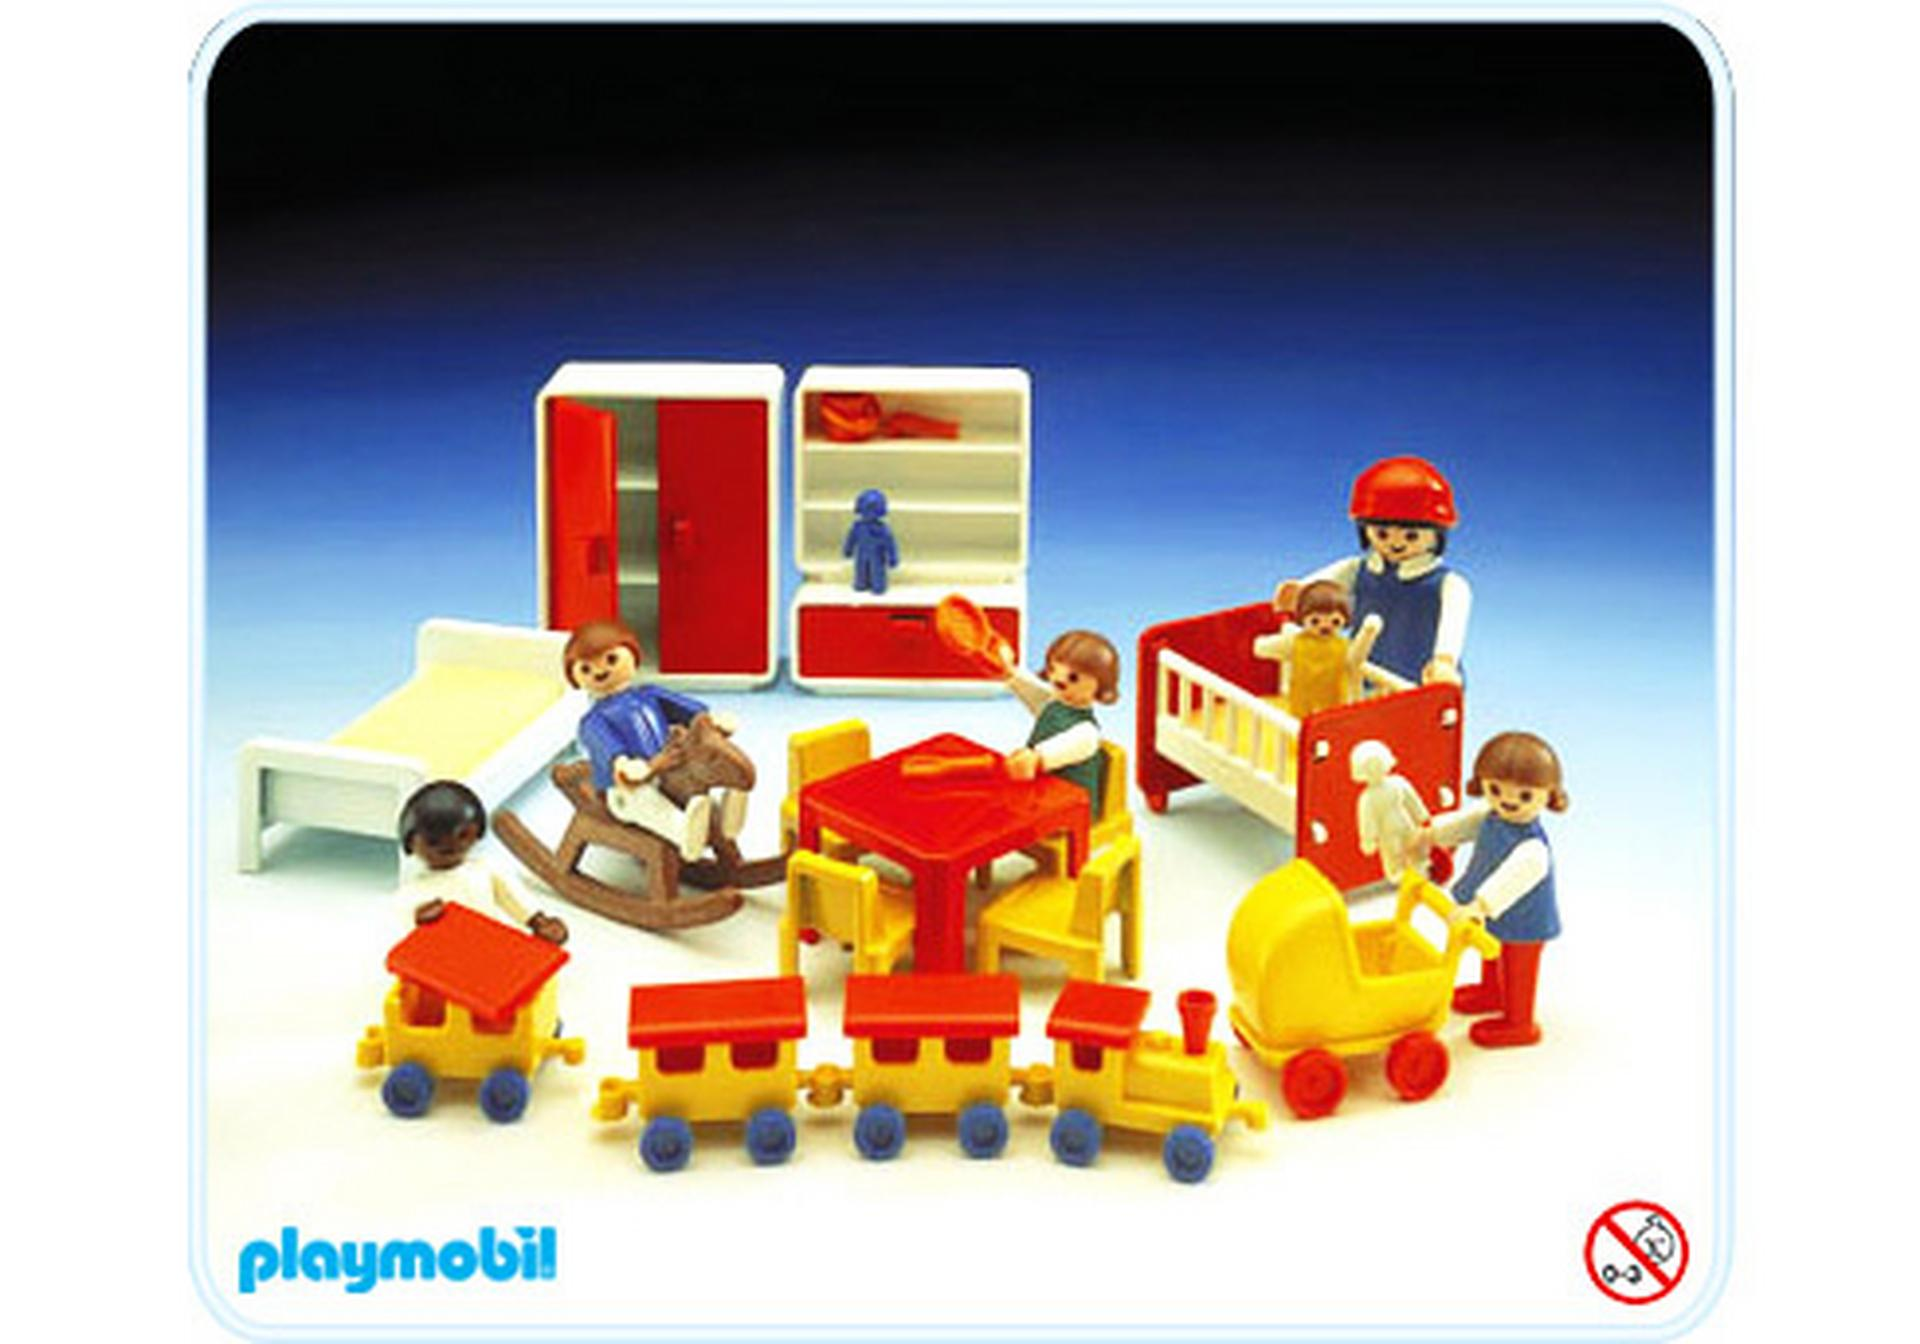 Kinderzimmer 3290 a playmobil for Kinderzimmer playmobil